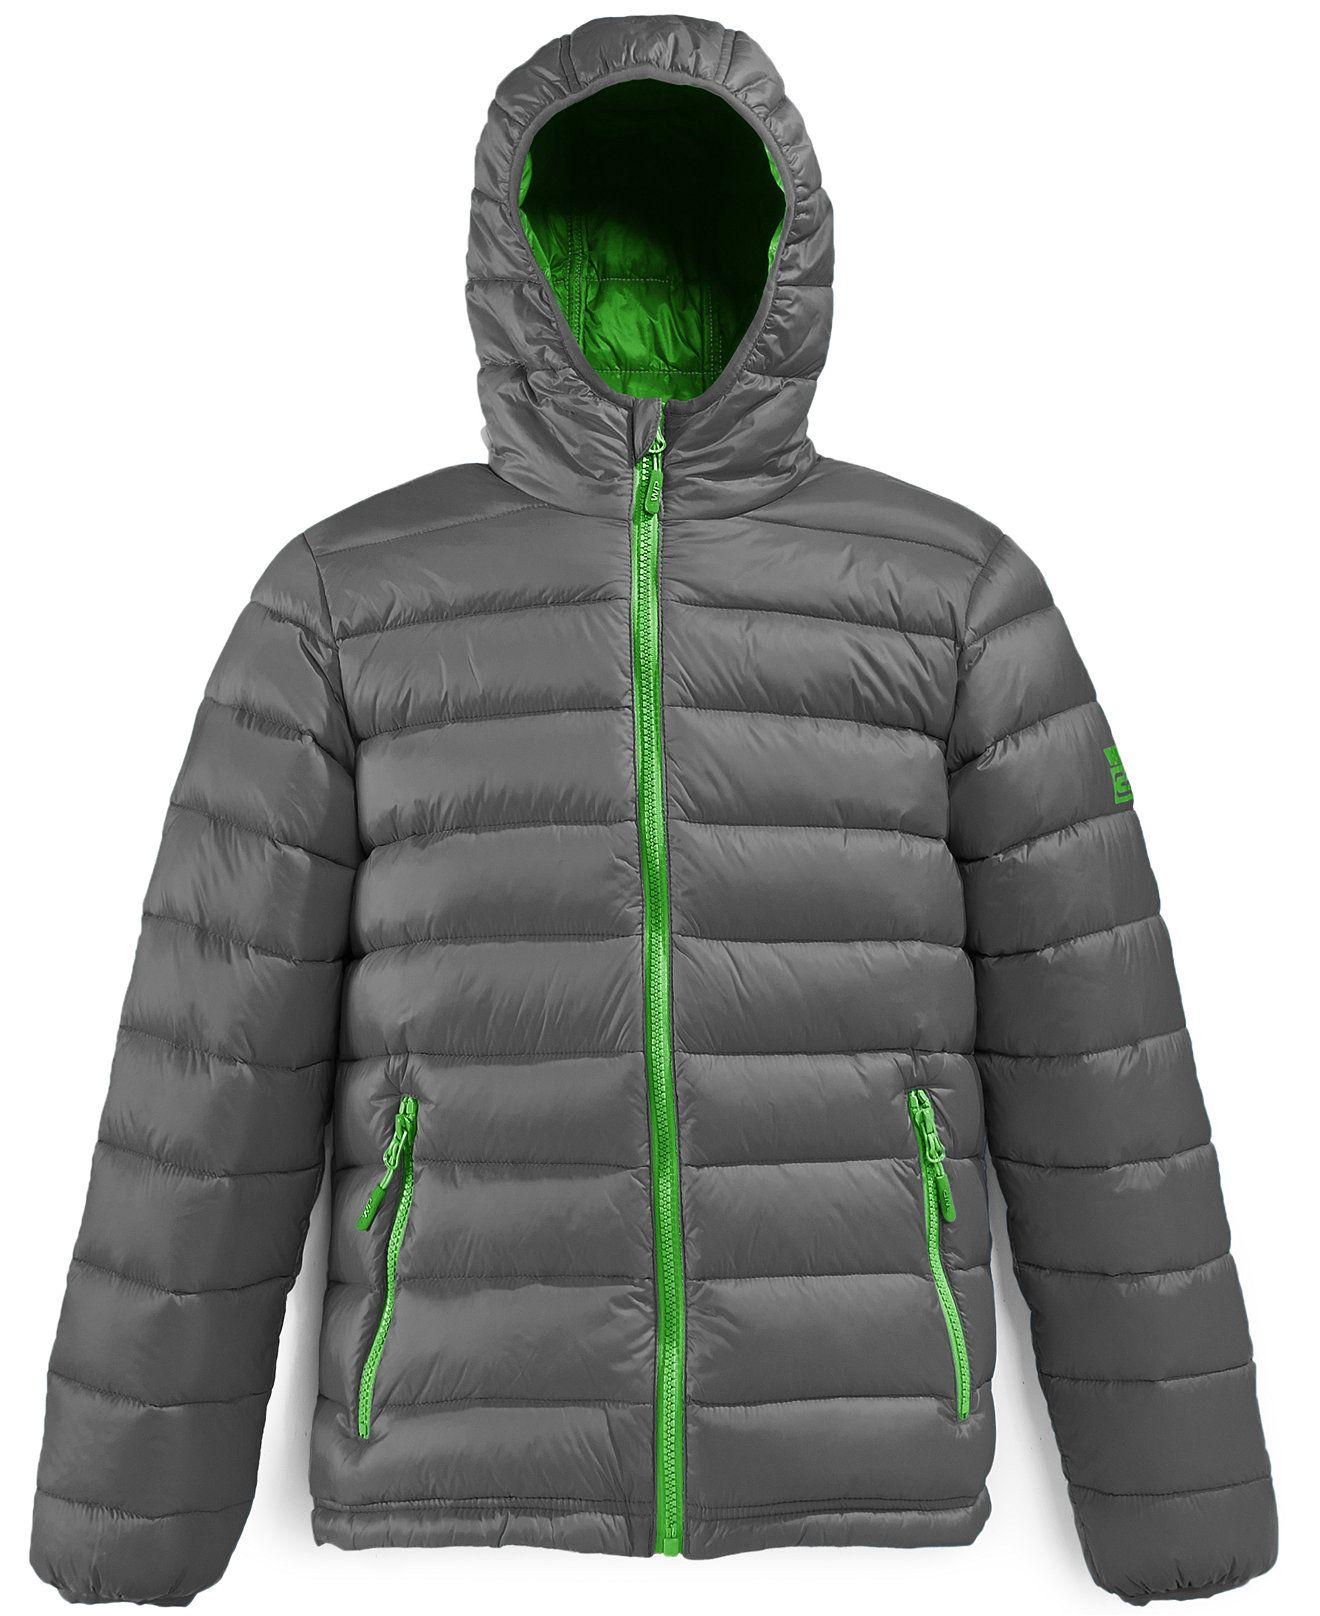 b76ab6dd2c24 Weatherproof Boys  Packable Down Lightweight Jacket - Kids Jackets ...